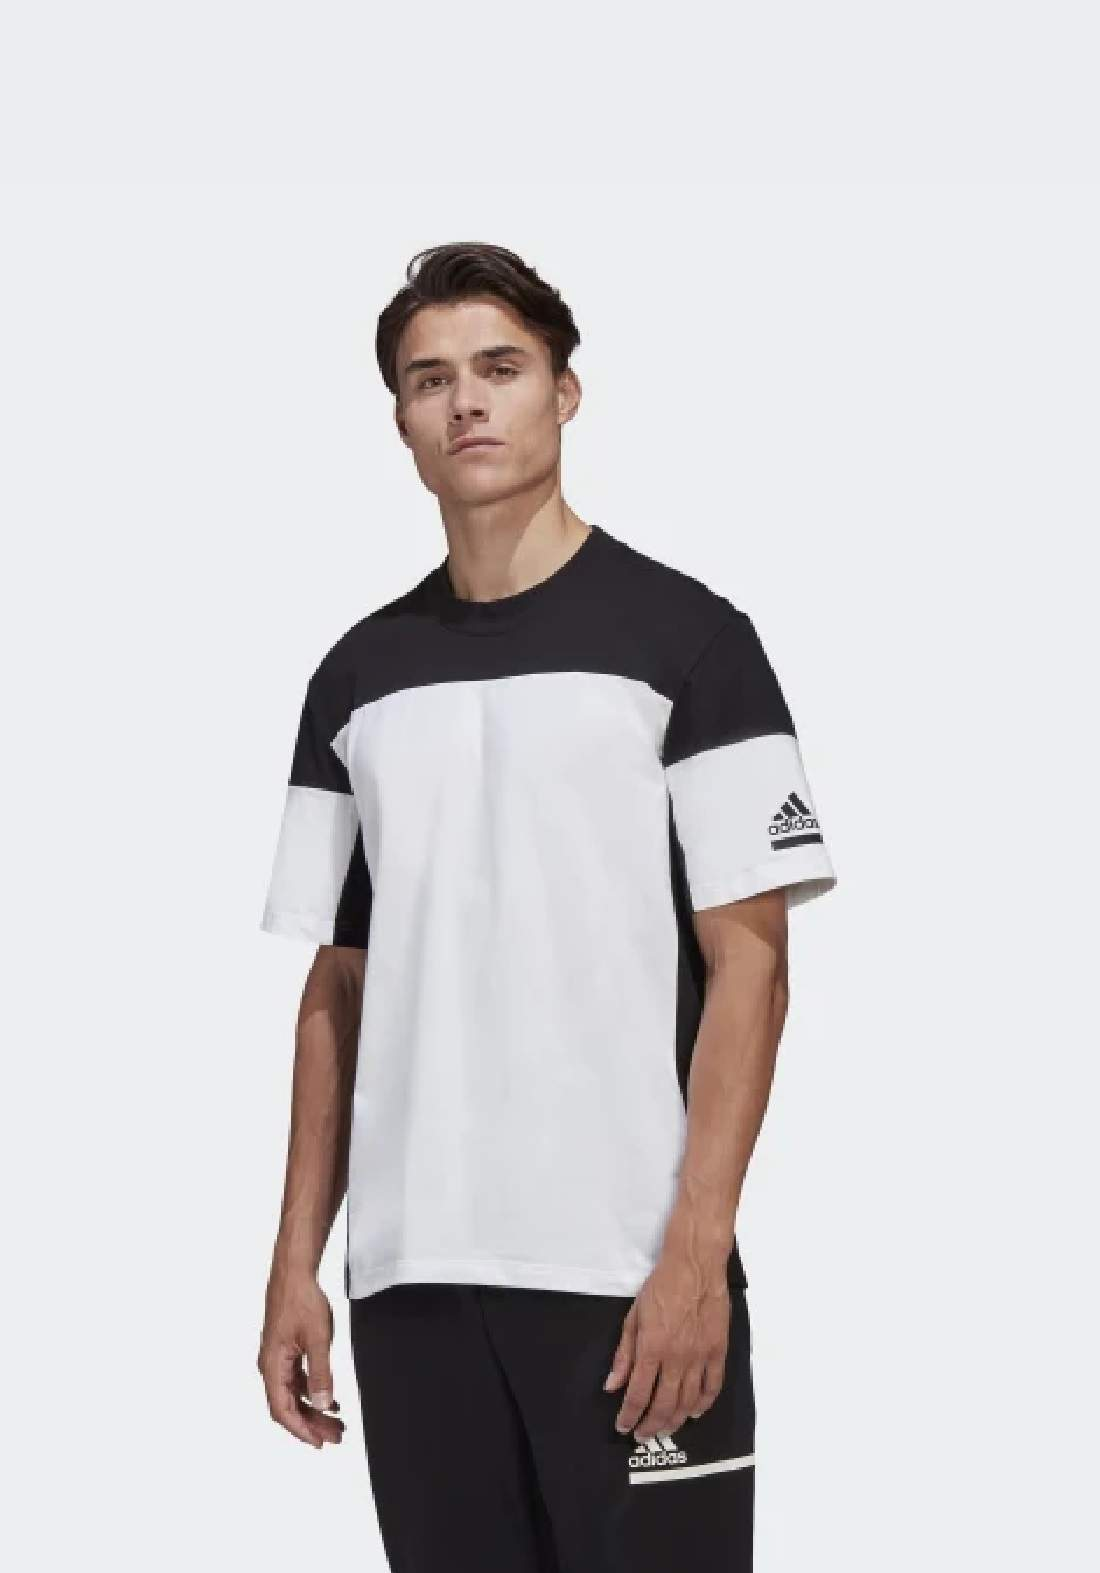 Adidas تيشيرت رجالي رياضي متعدد الالوان من